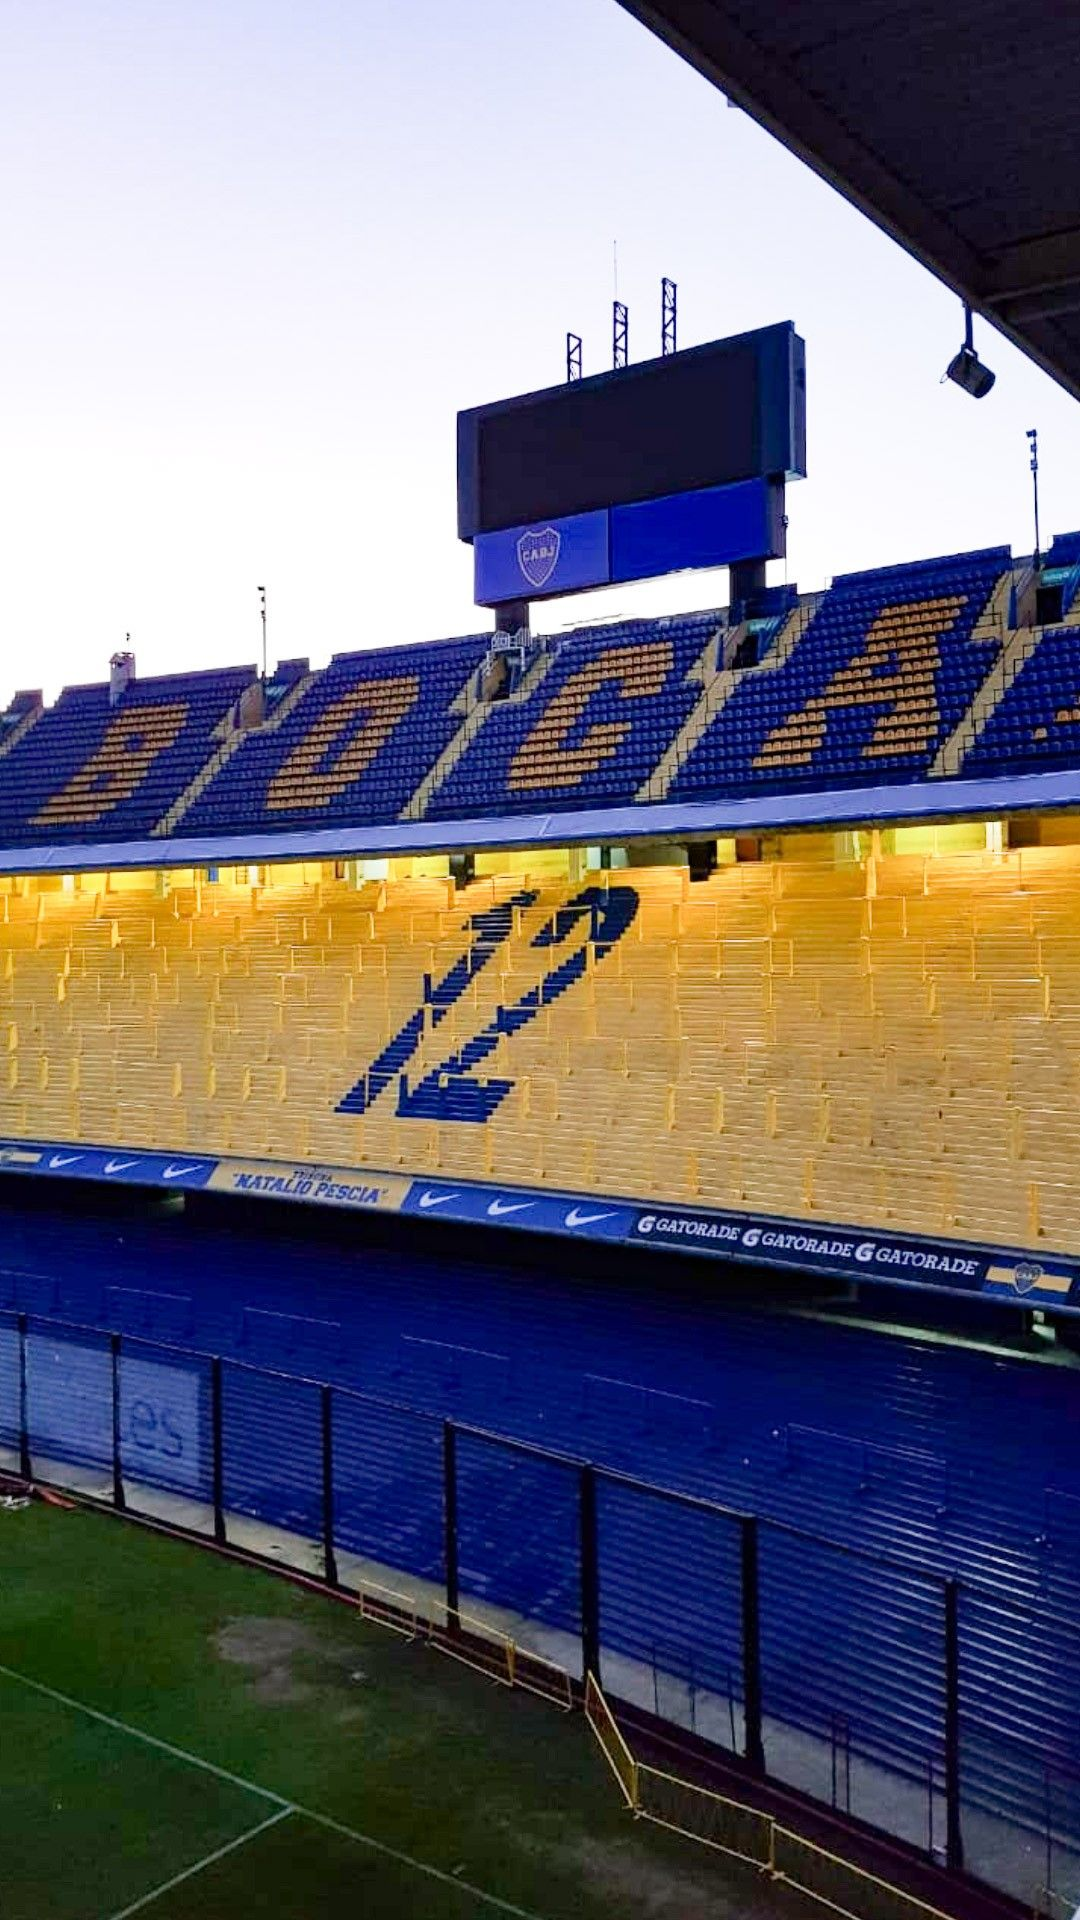 bombonera 360 nuovo stadio boca juniors progetto ameal